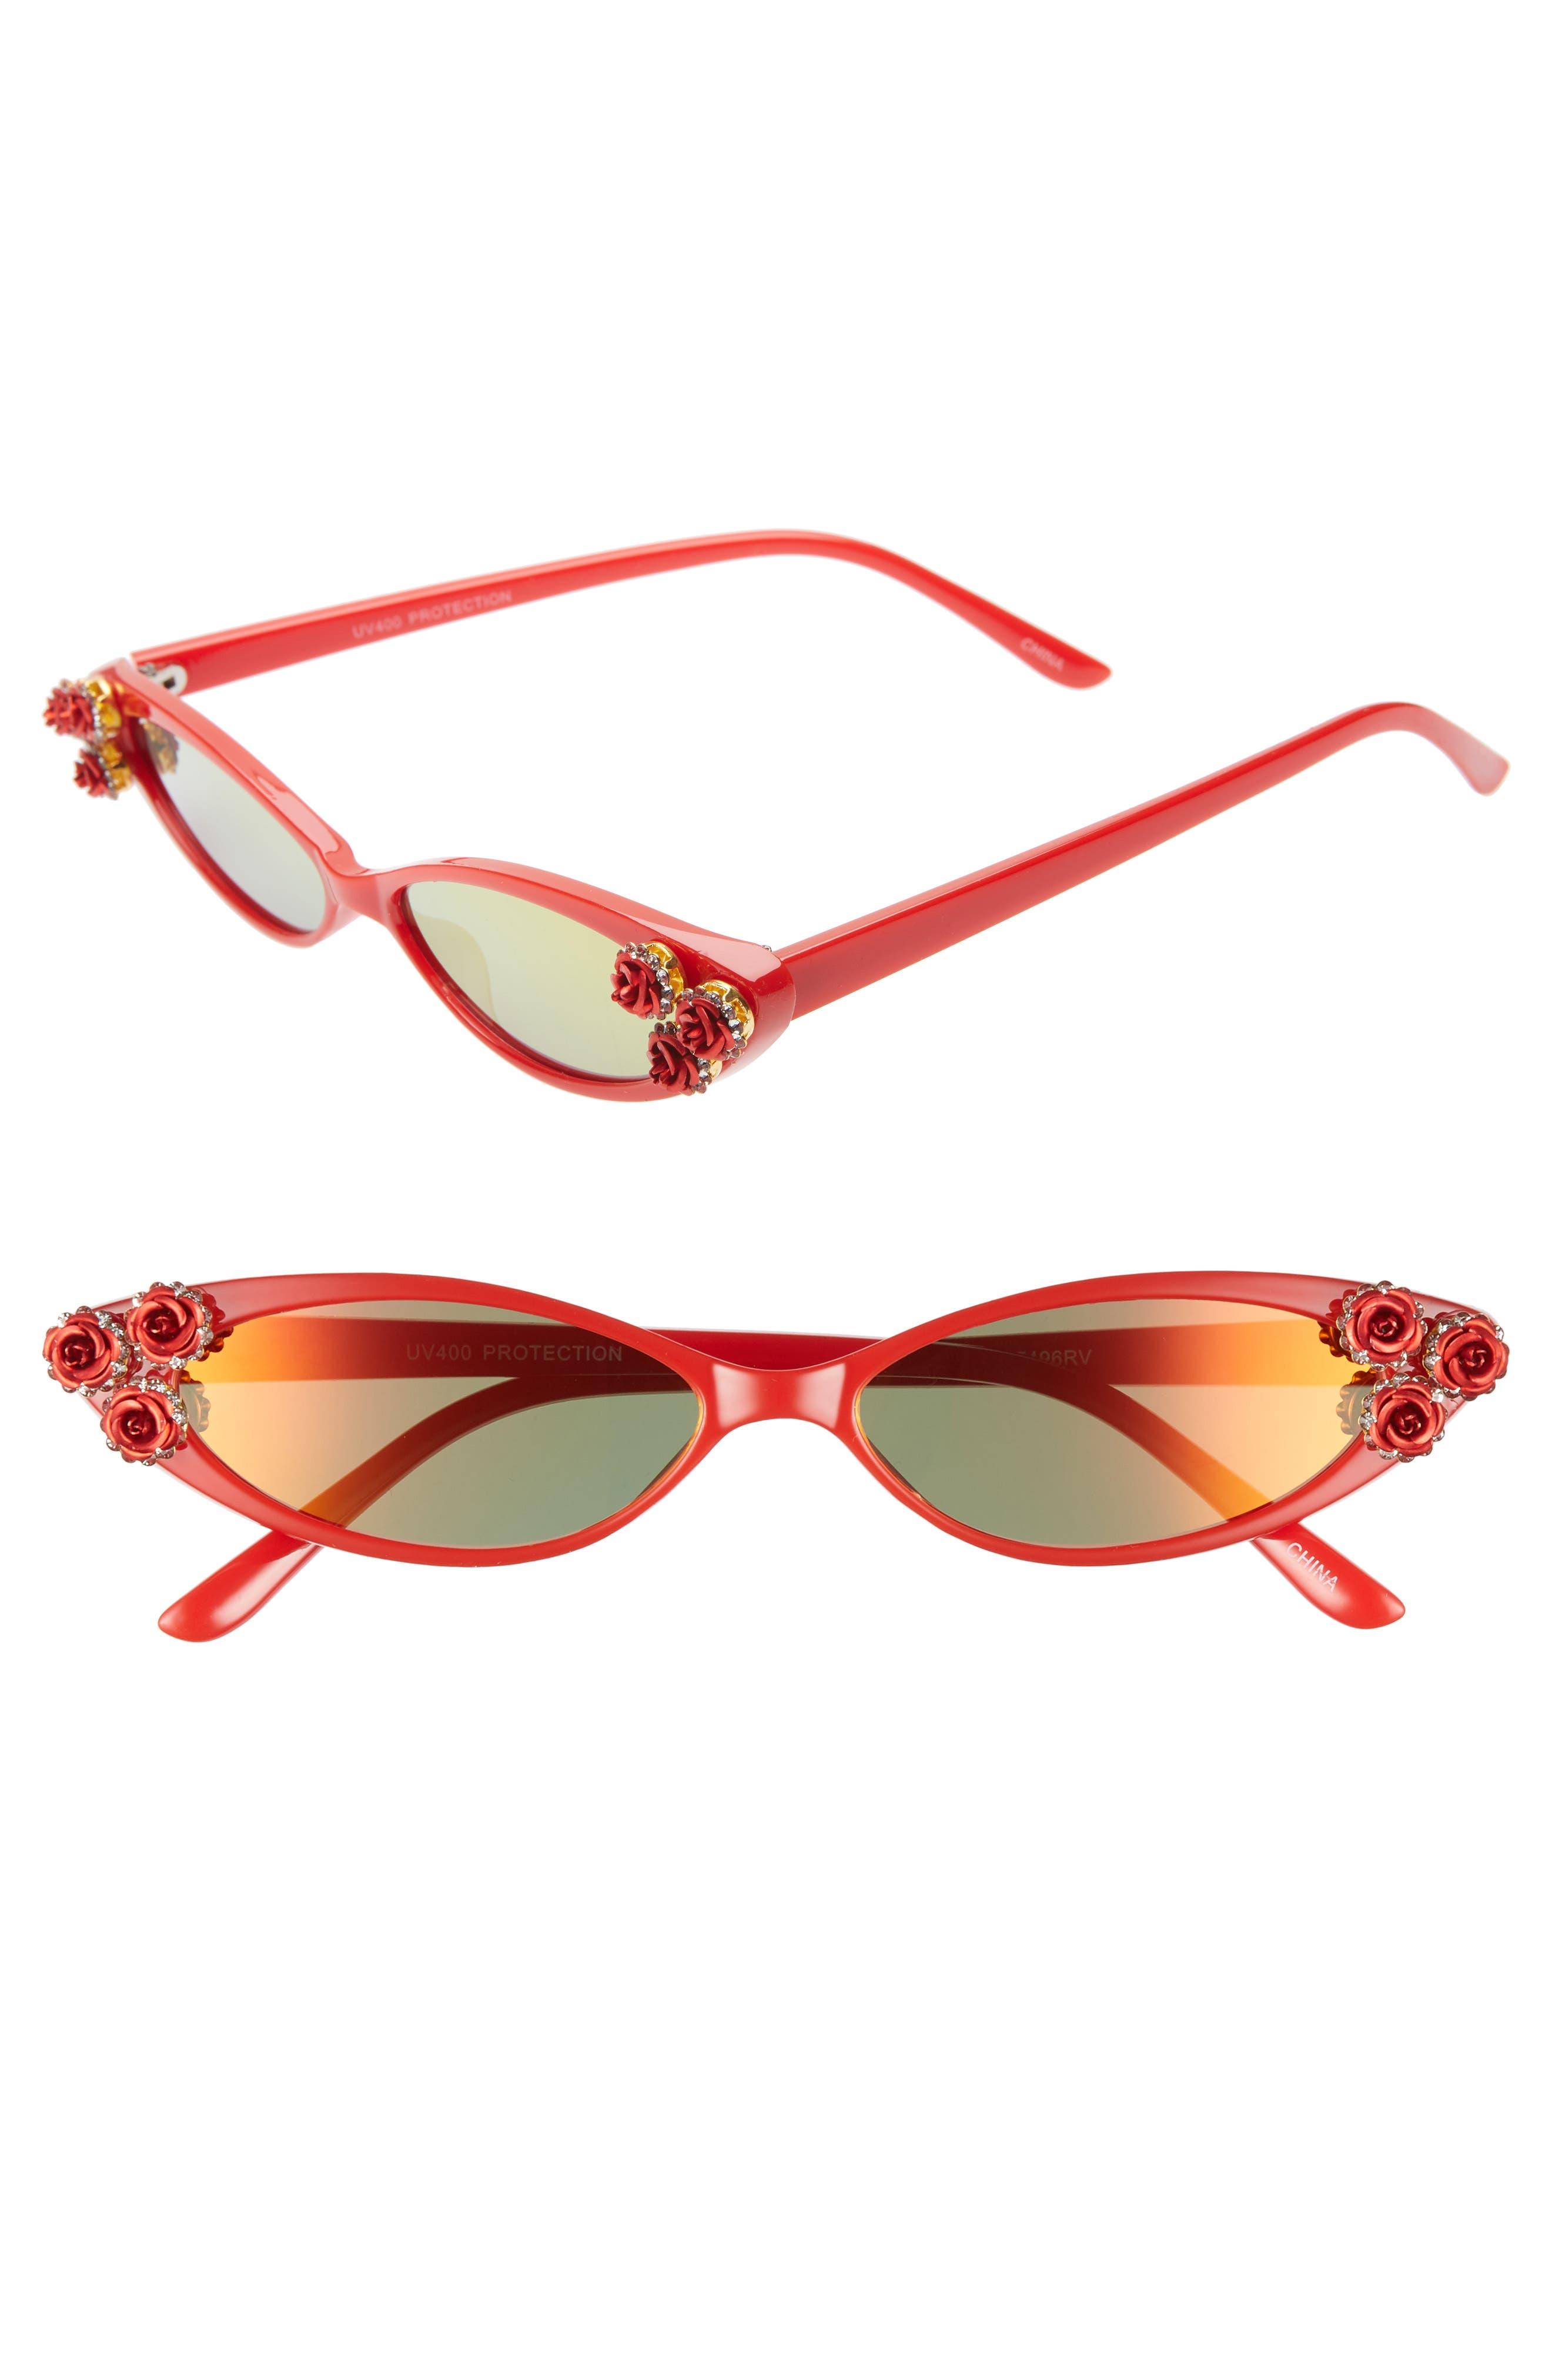 Rad + Refined Mini Oval Sunglasses - Red/ Crystal